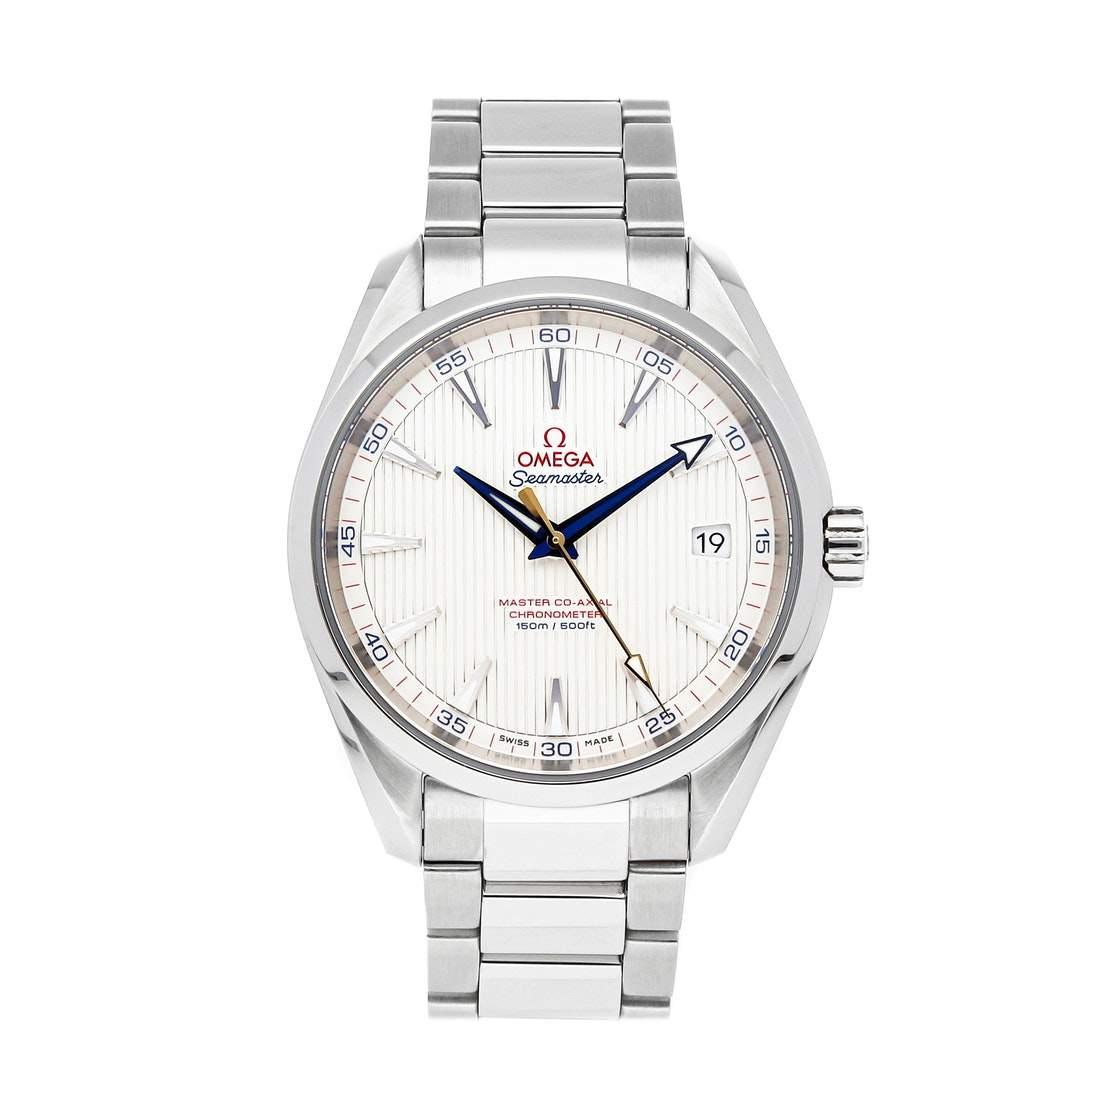 "Omega Silver Stainless Steel Seamaster Aqua Terra ""Golf Edition"" 231.10.42.21.02.004 Men's Wristwatch 41.5 MM"